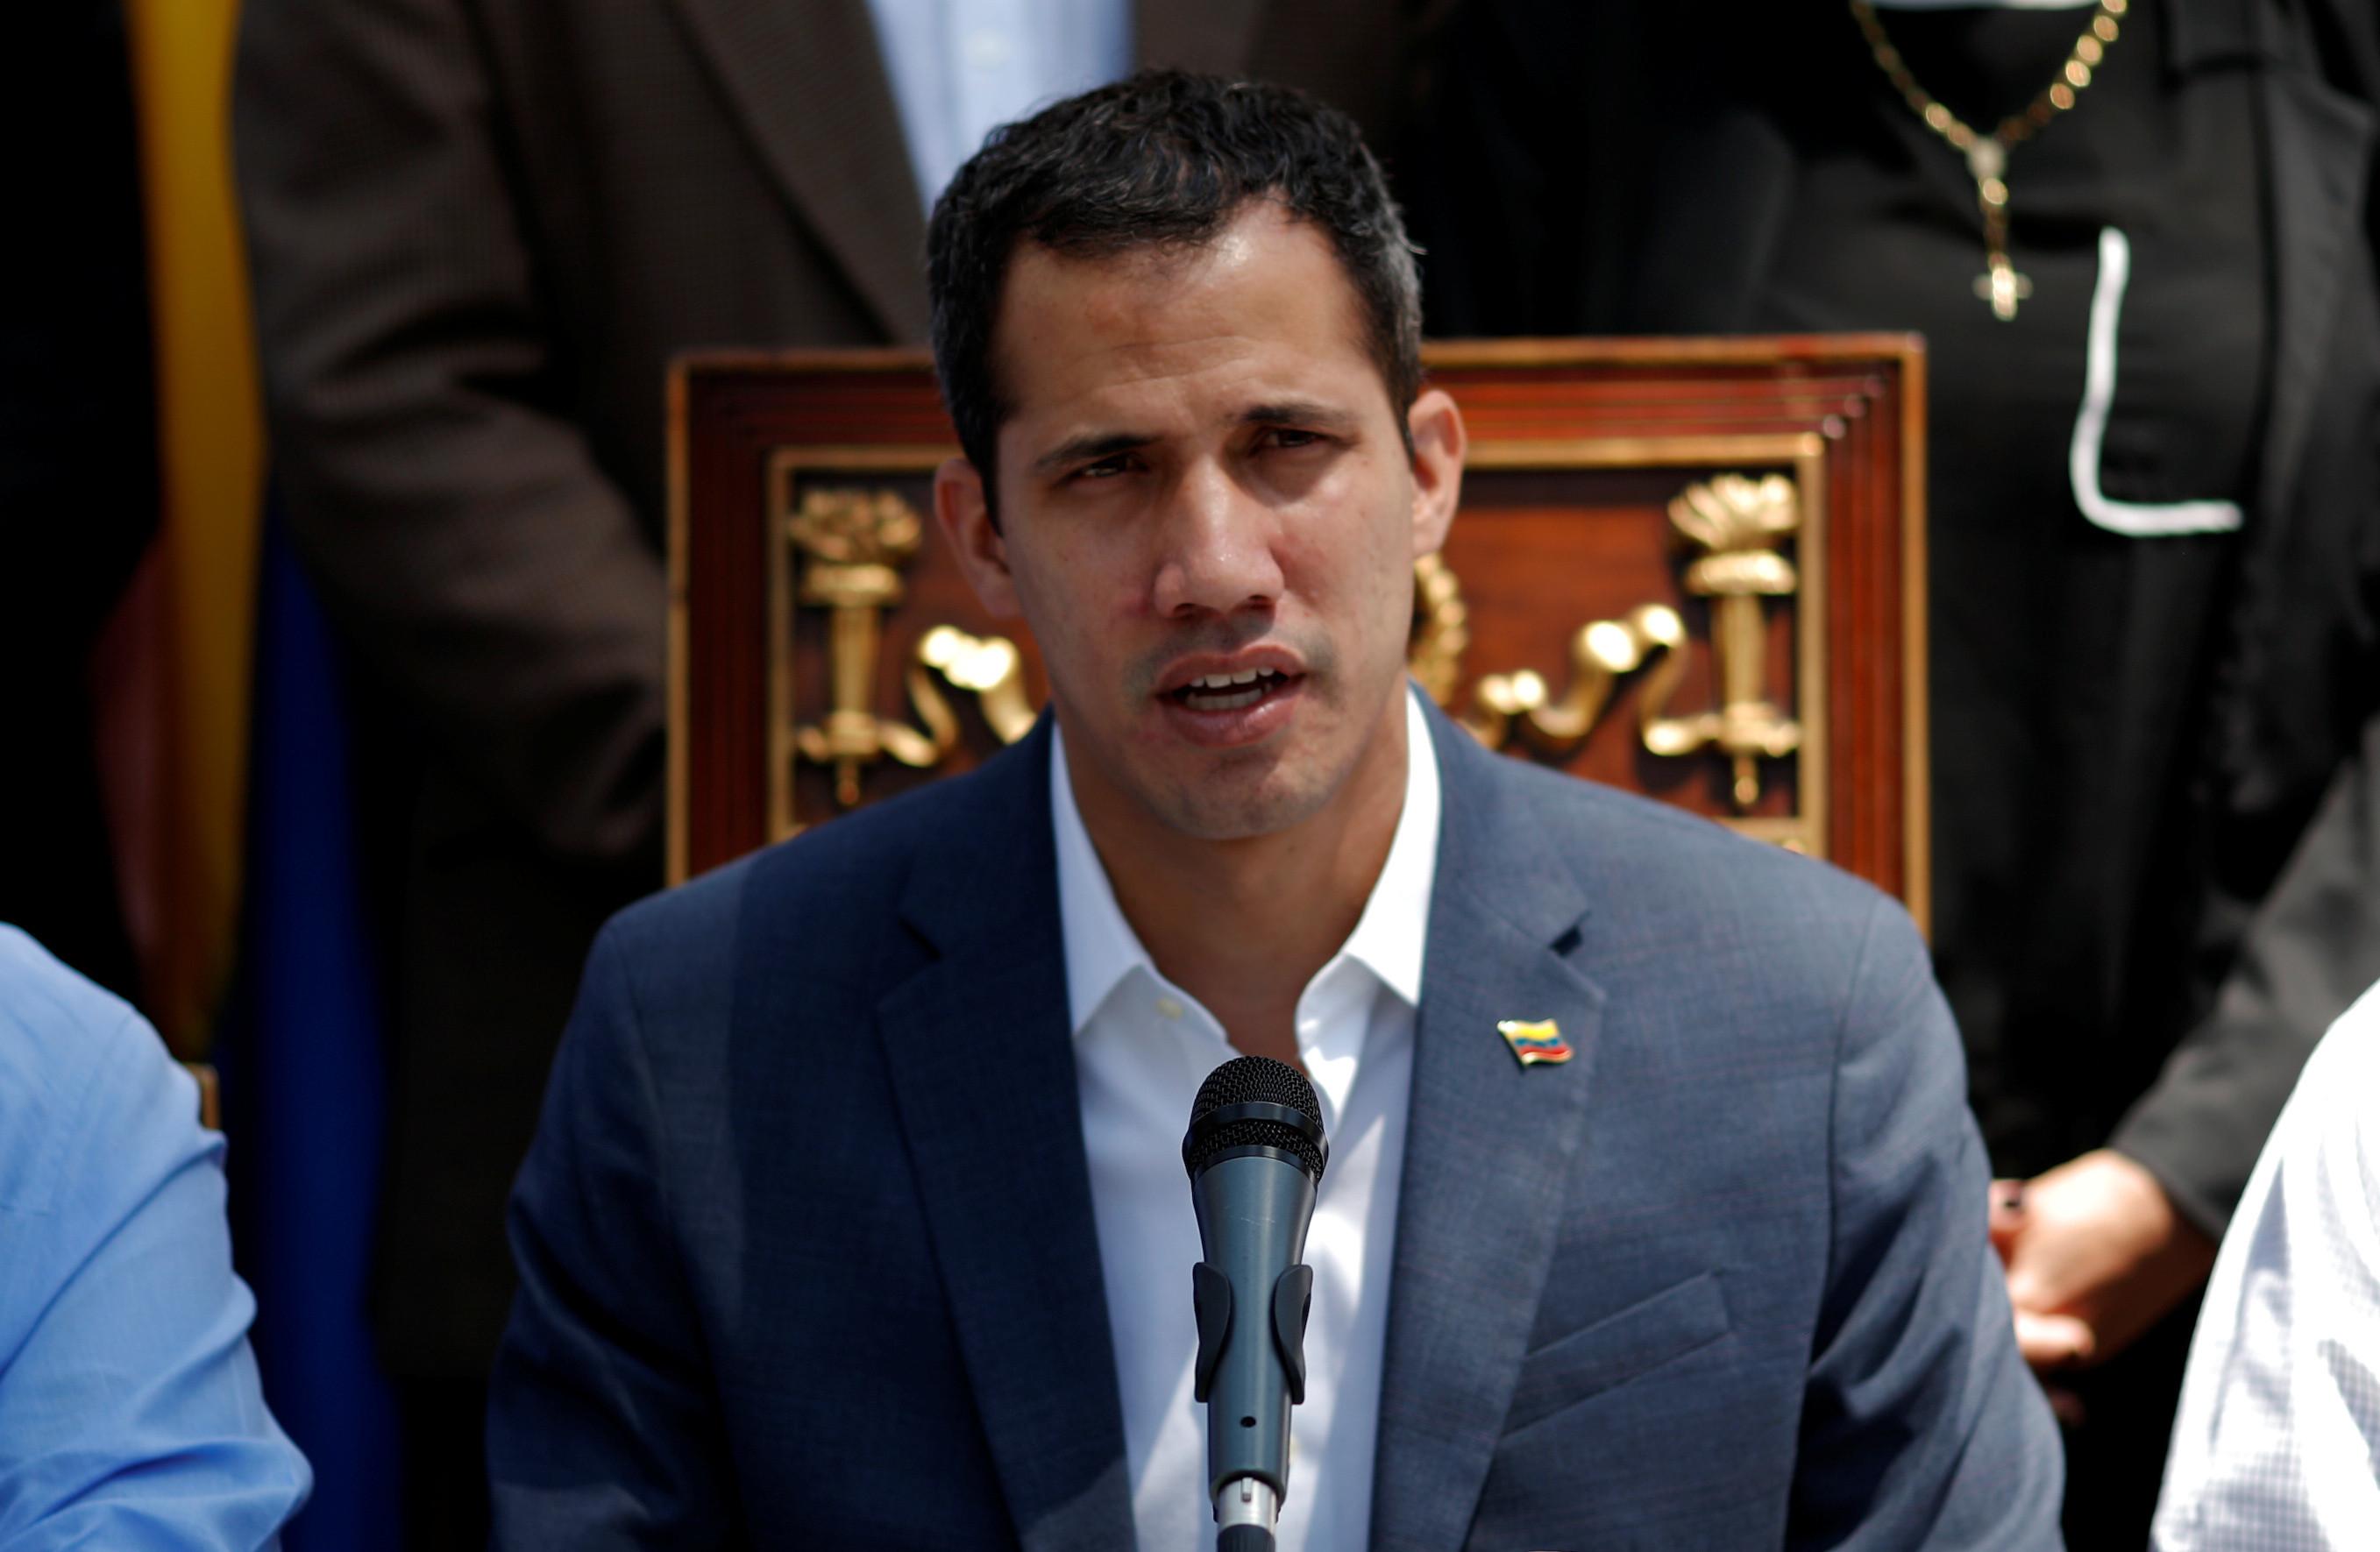 Chefe de gabinete de Guaidó detido